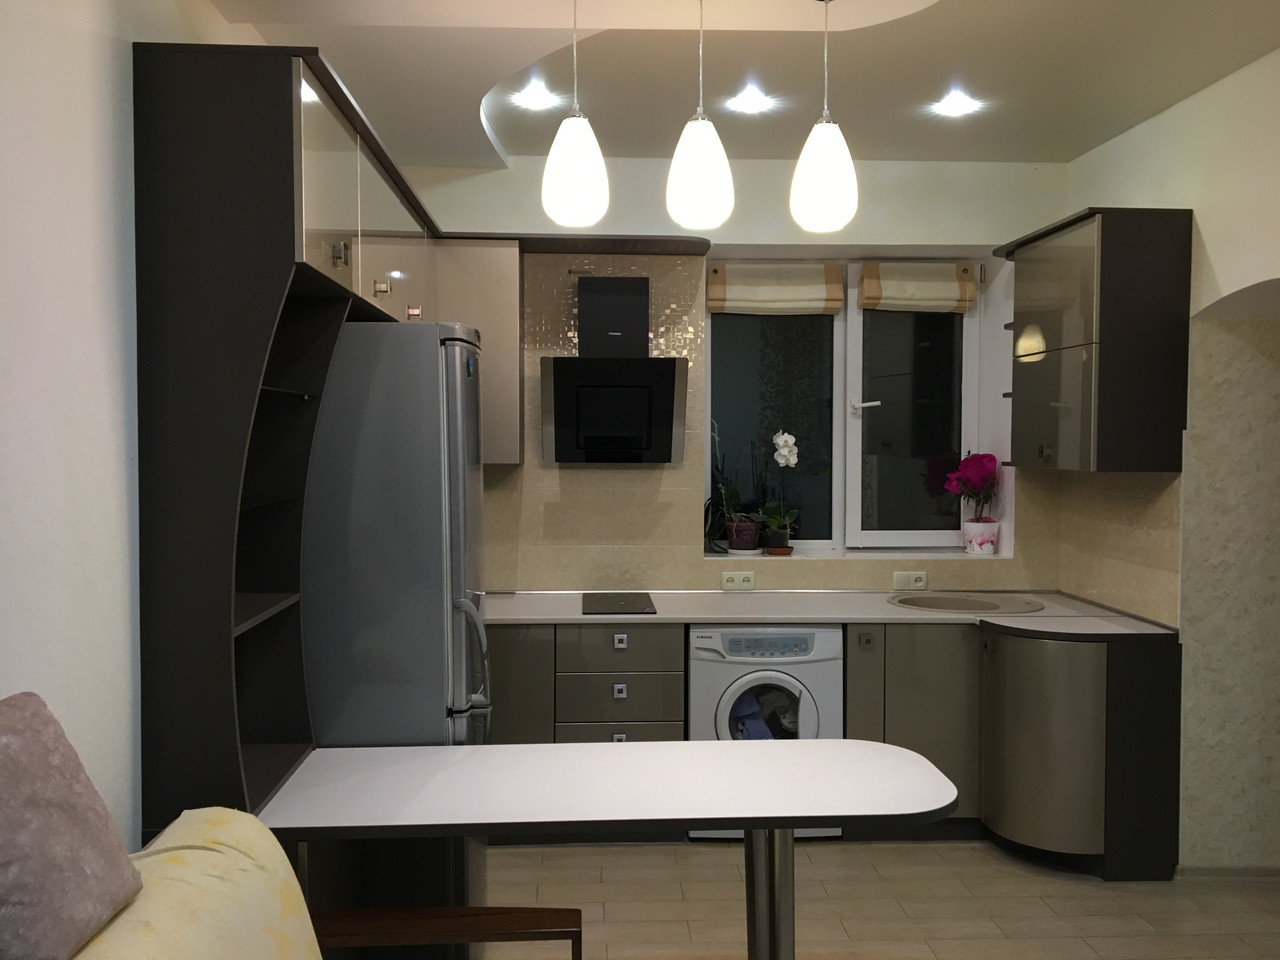 Кухня с глянцевыми крашеными фасадами МДФ